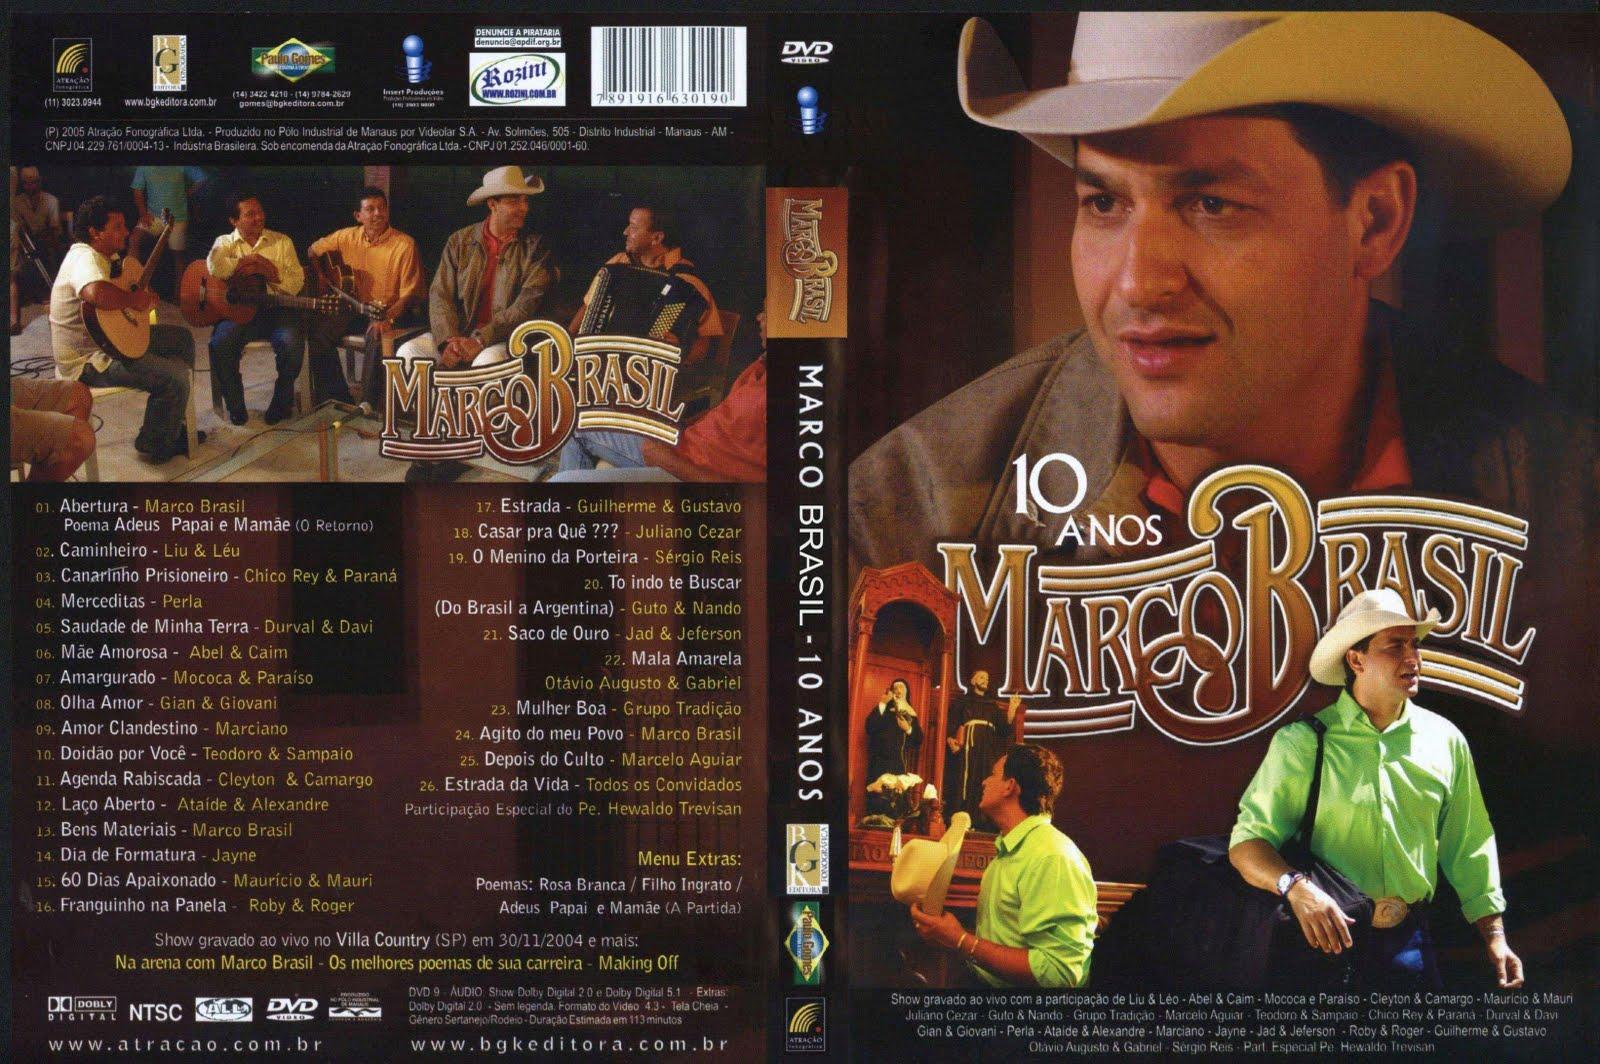 SAMPAIO ANOS DVD 30 GRATIS BAIXAR E TEODORO